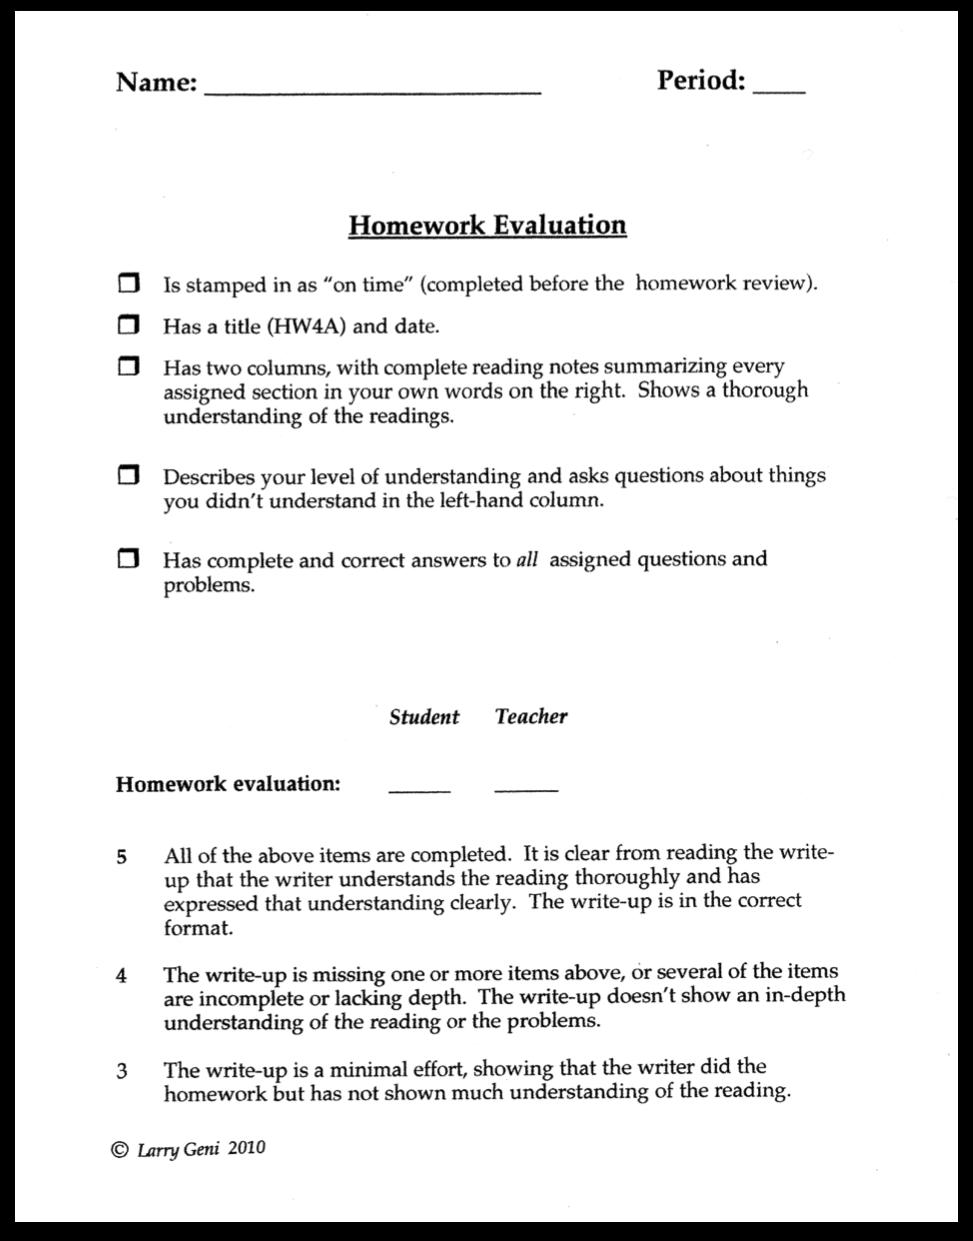 homework eval.png